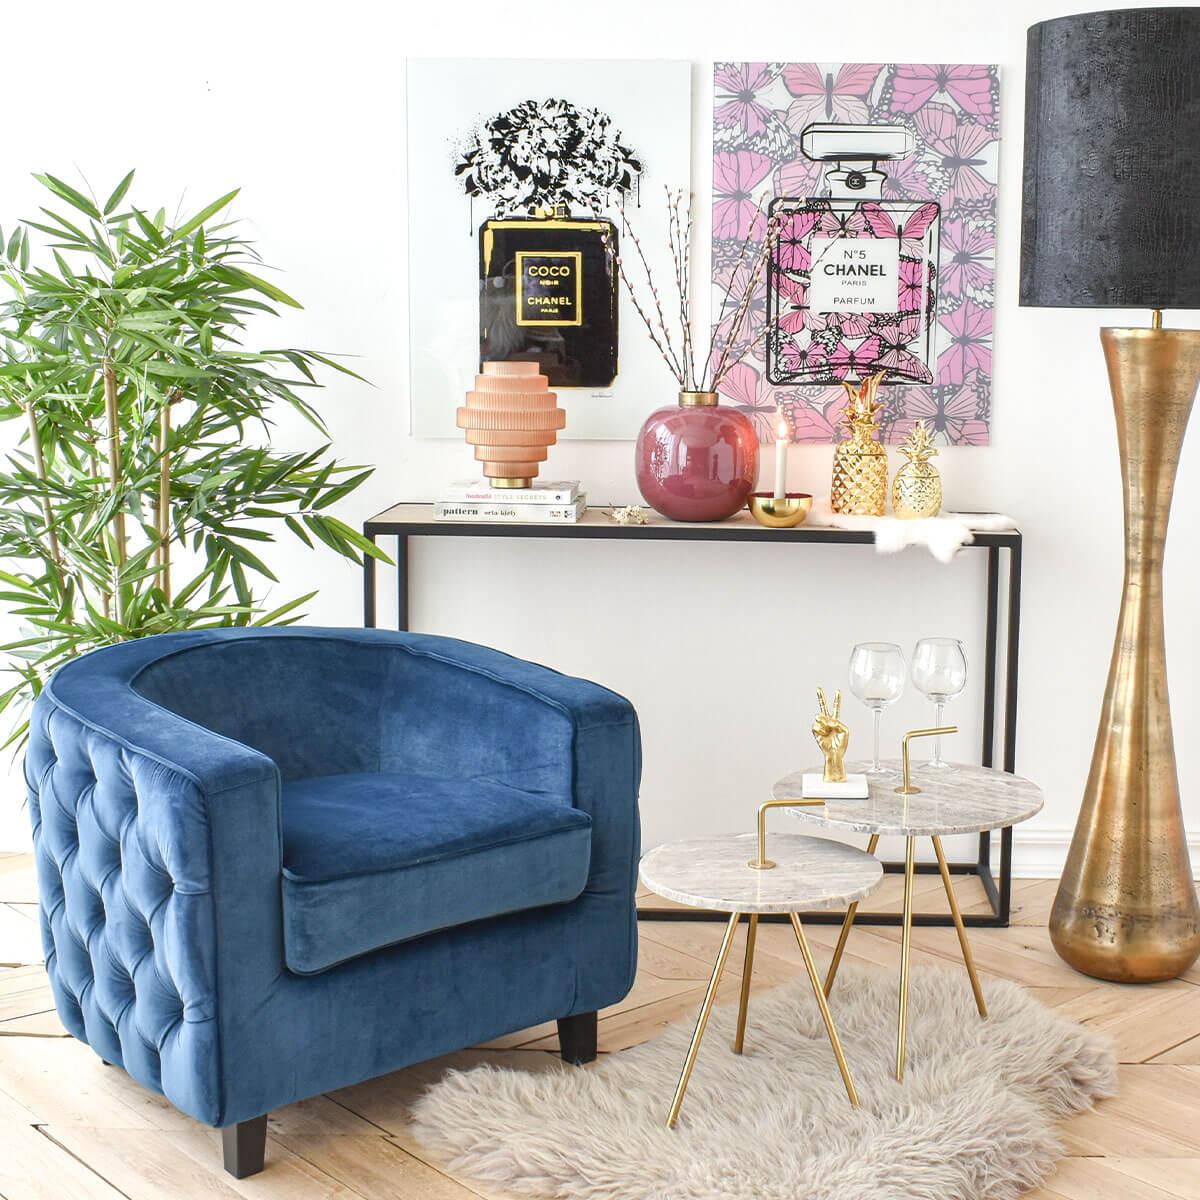 blue-quilted-club-chair-in-dubai